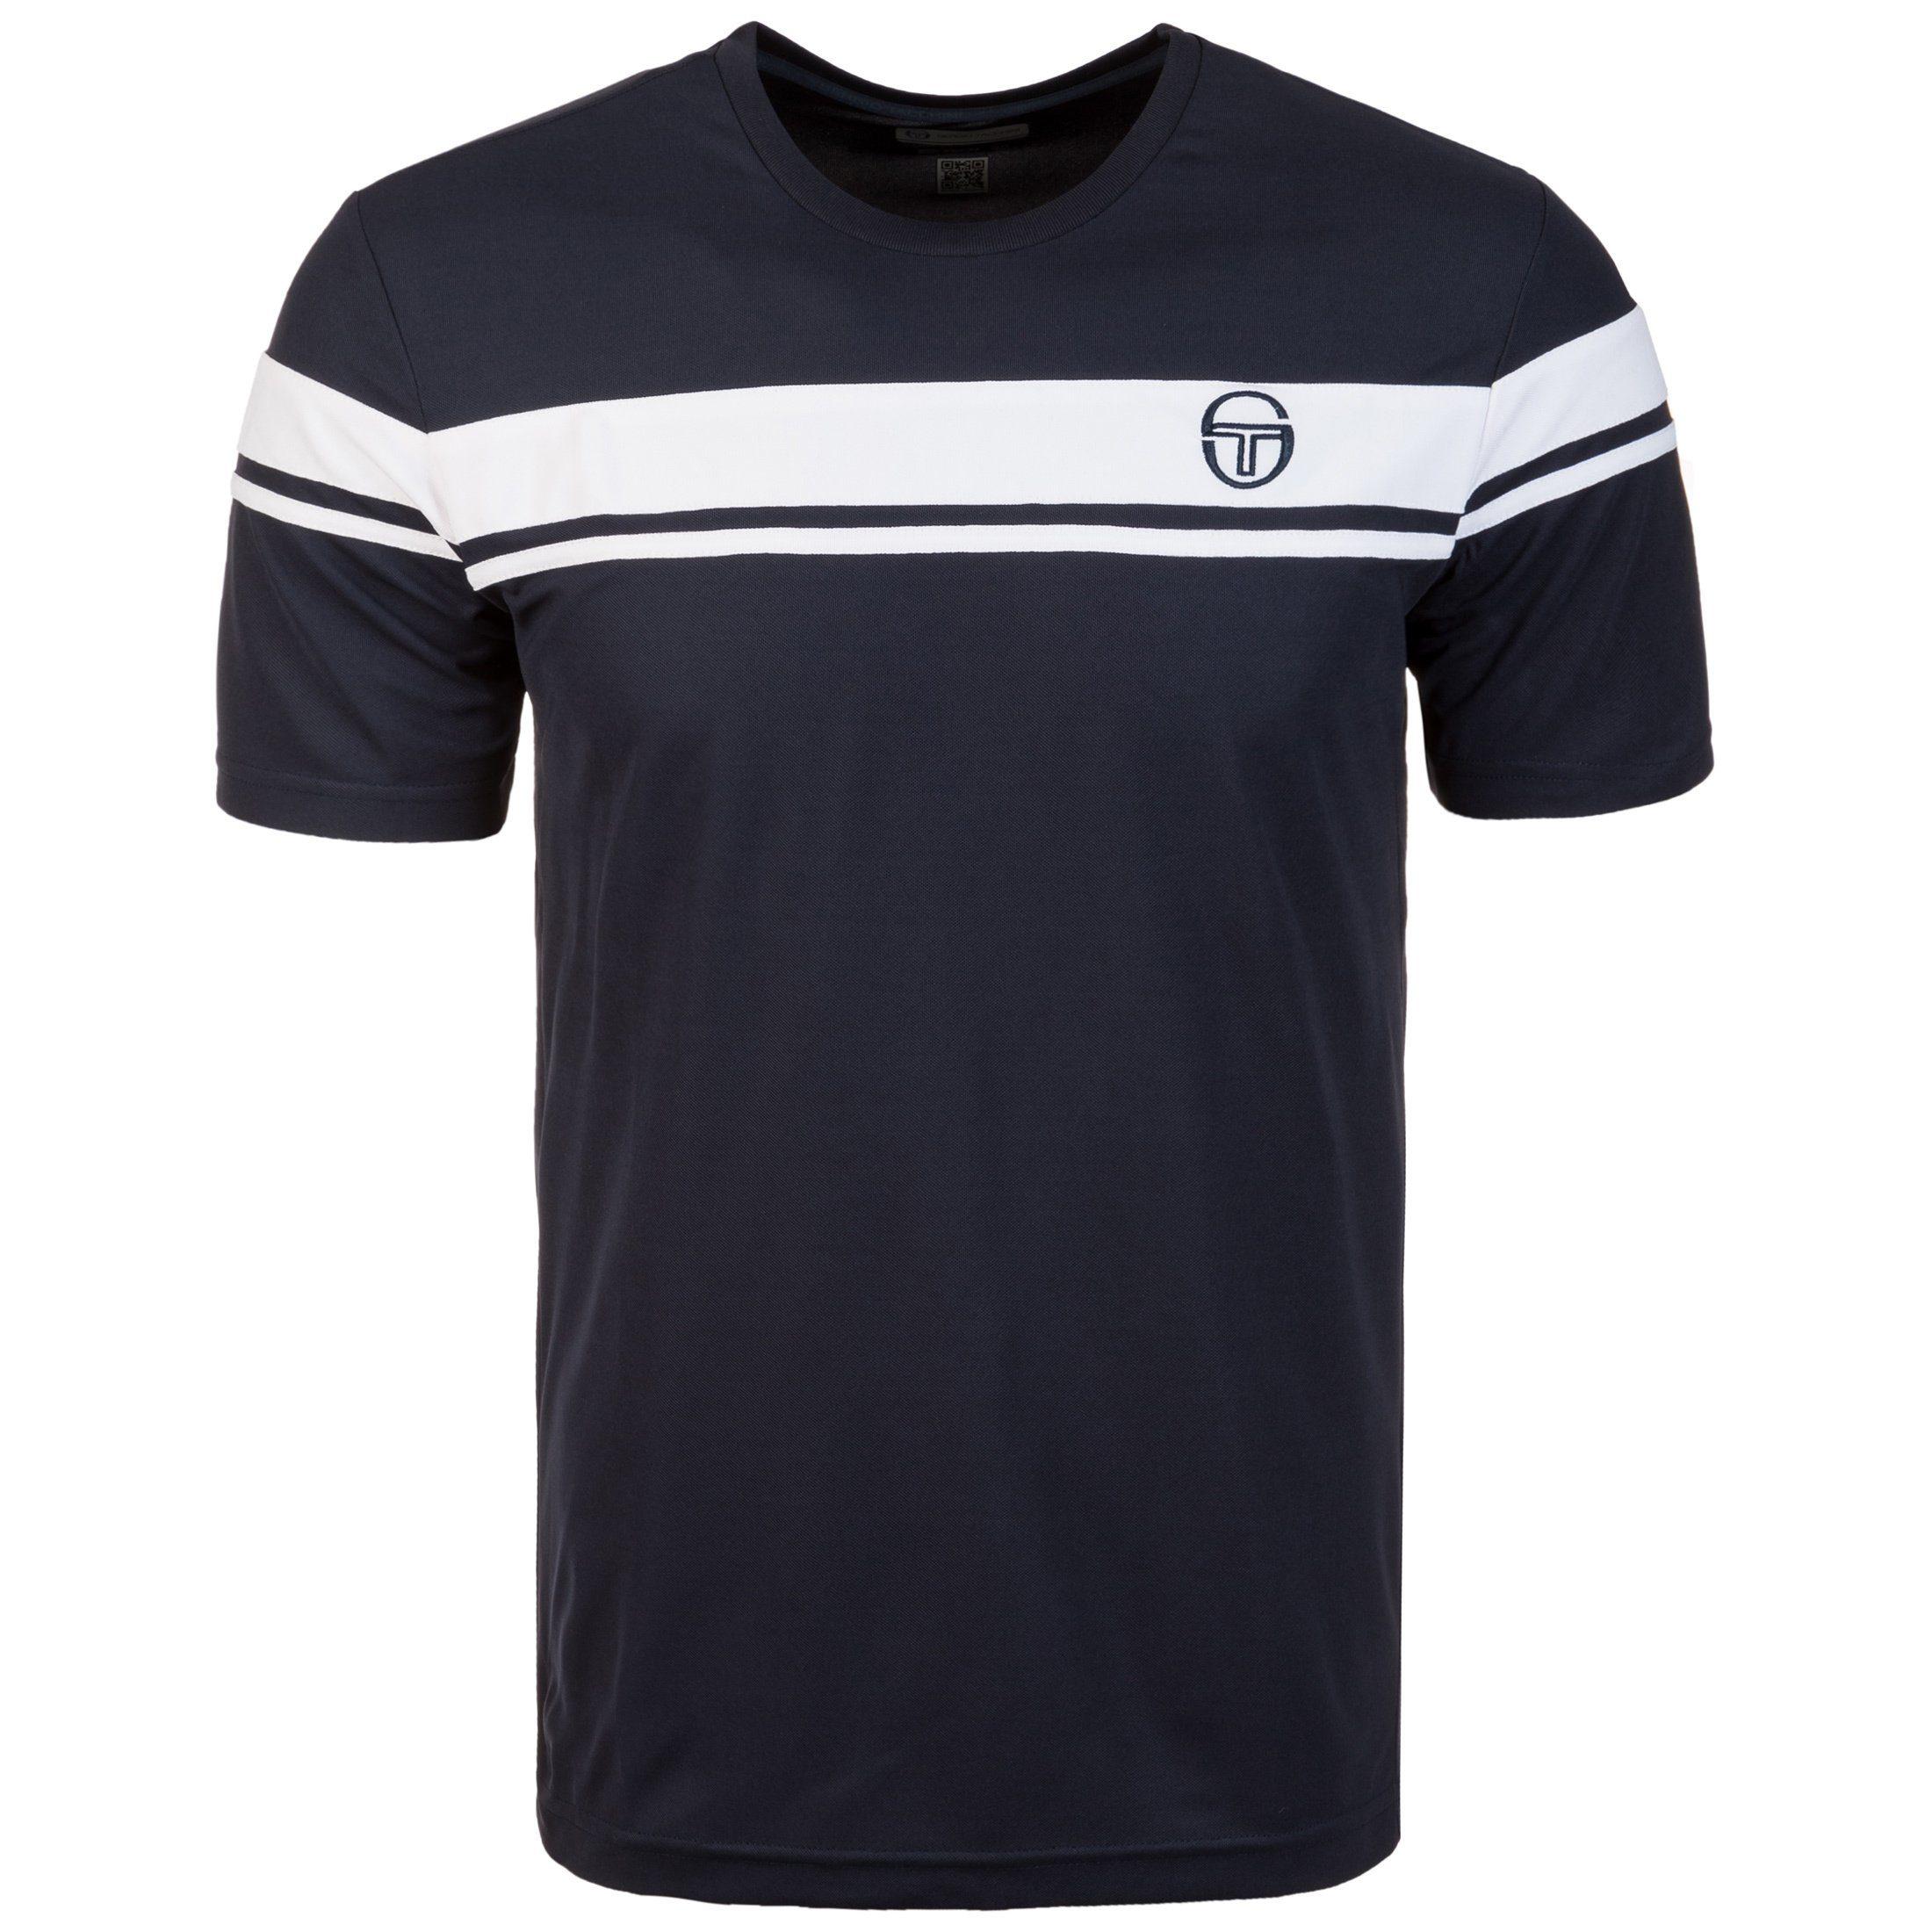 Sergio Tacchini T-Shirt Young Line Pro | Bekleidung > Shirts > Sonstige Shirts | Blau | Sergio Tacchini